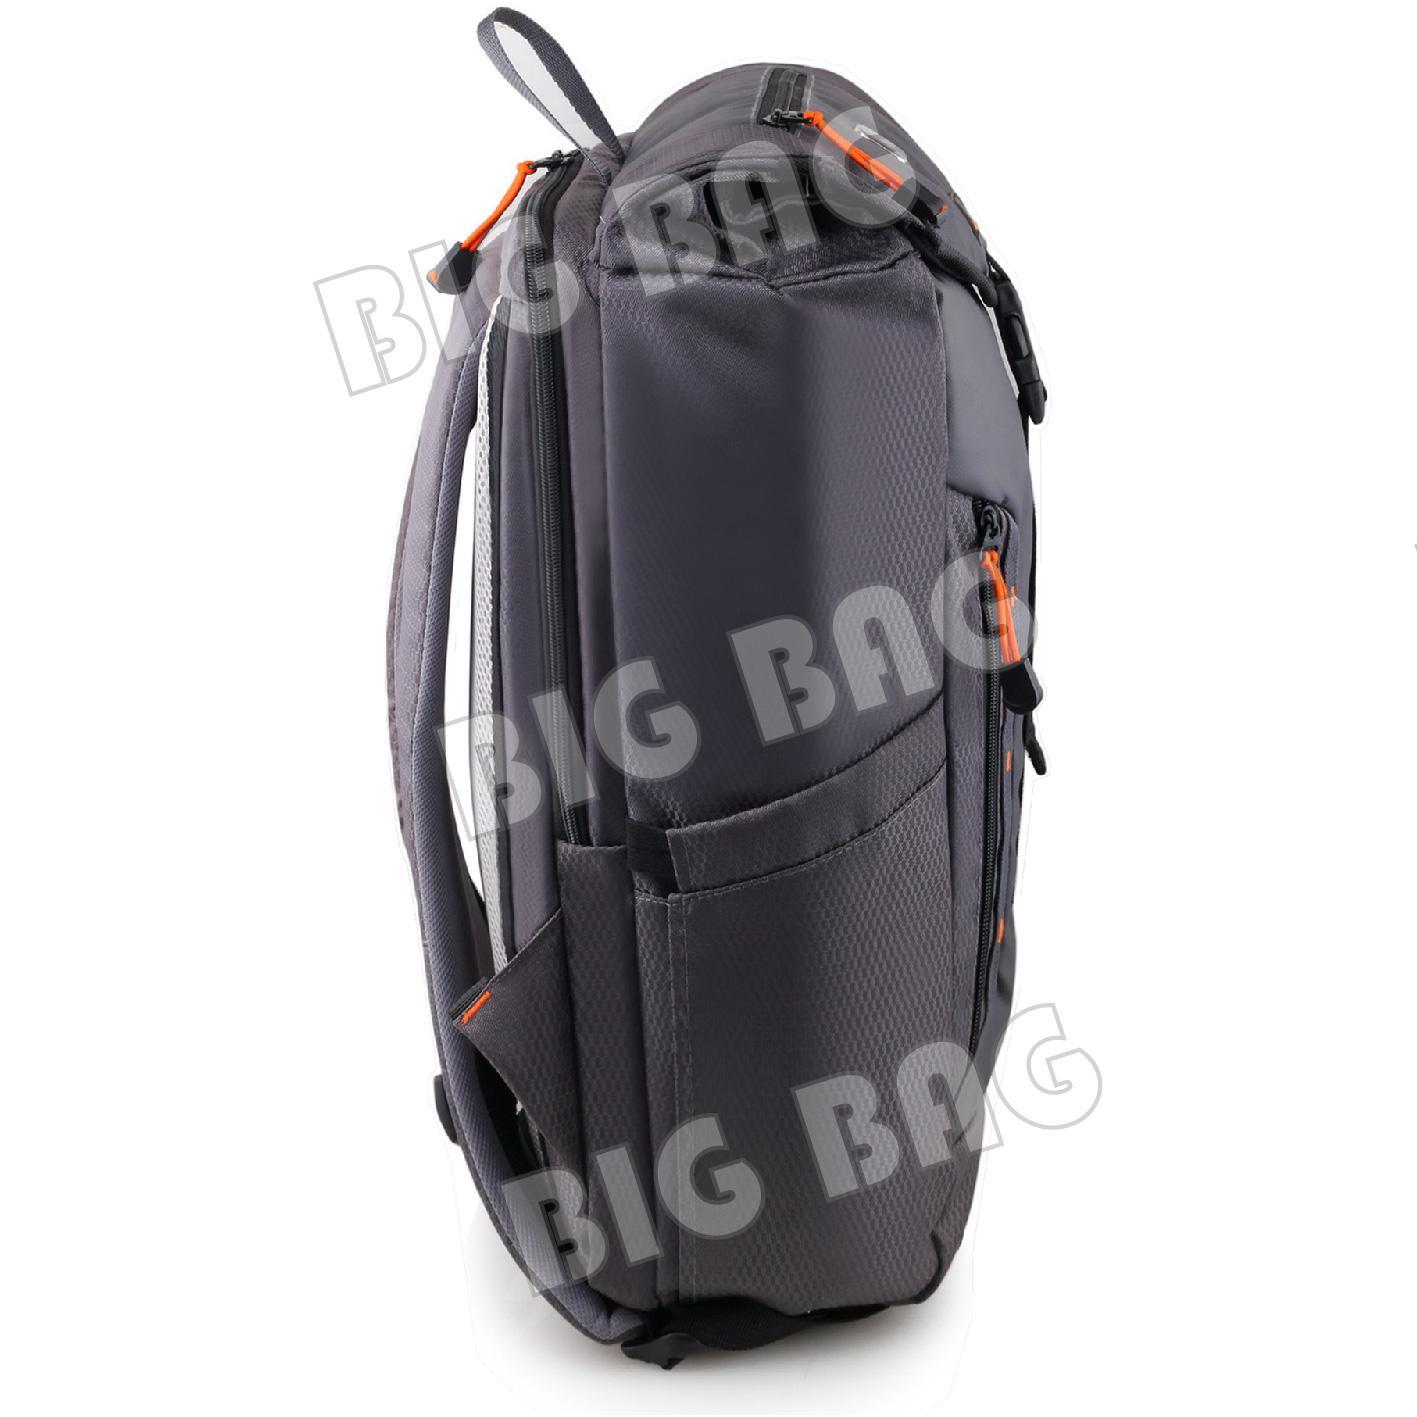 Kelebihan Tas Ransel Gear Bag Kingdom Backpack Raincover Free Camping Selempang Mini Dutchman Gunung